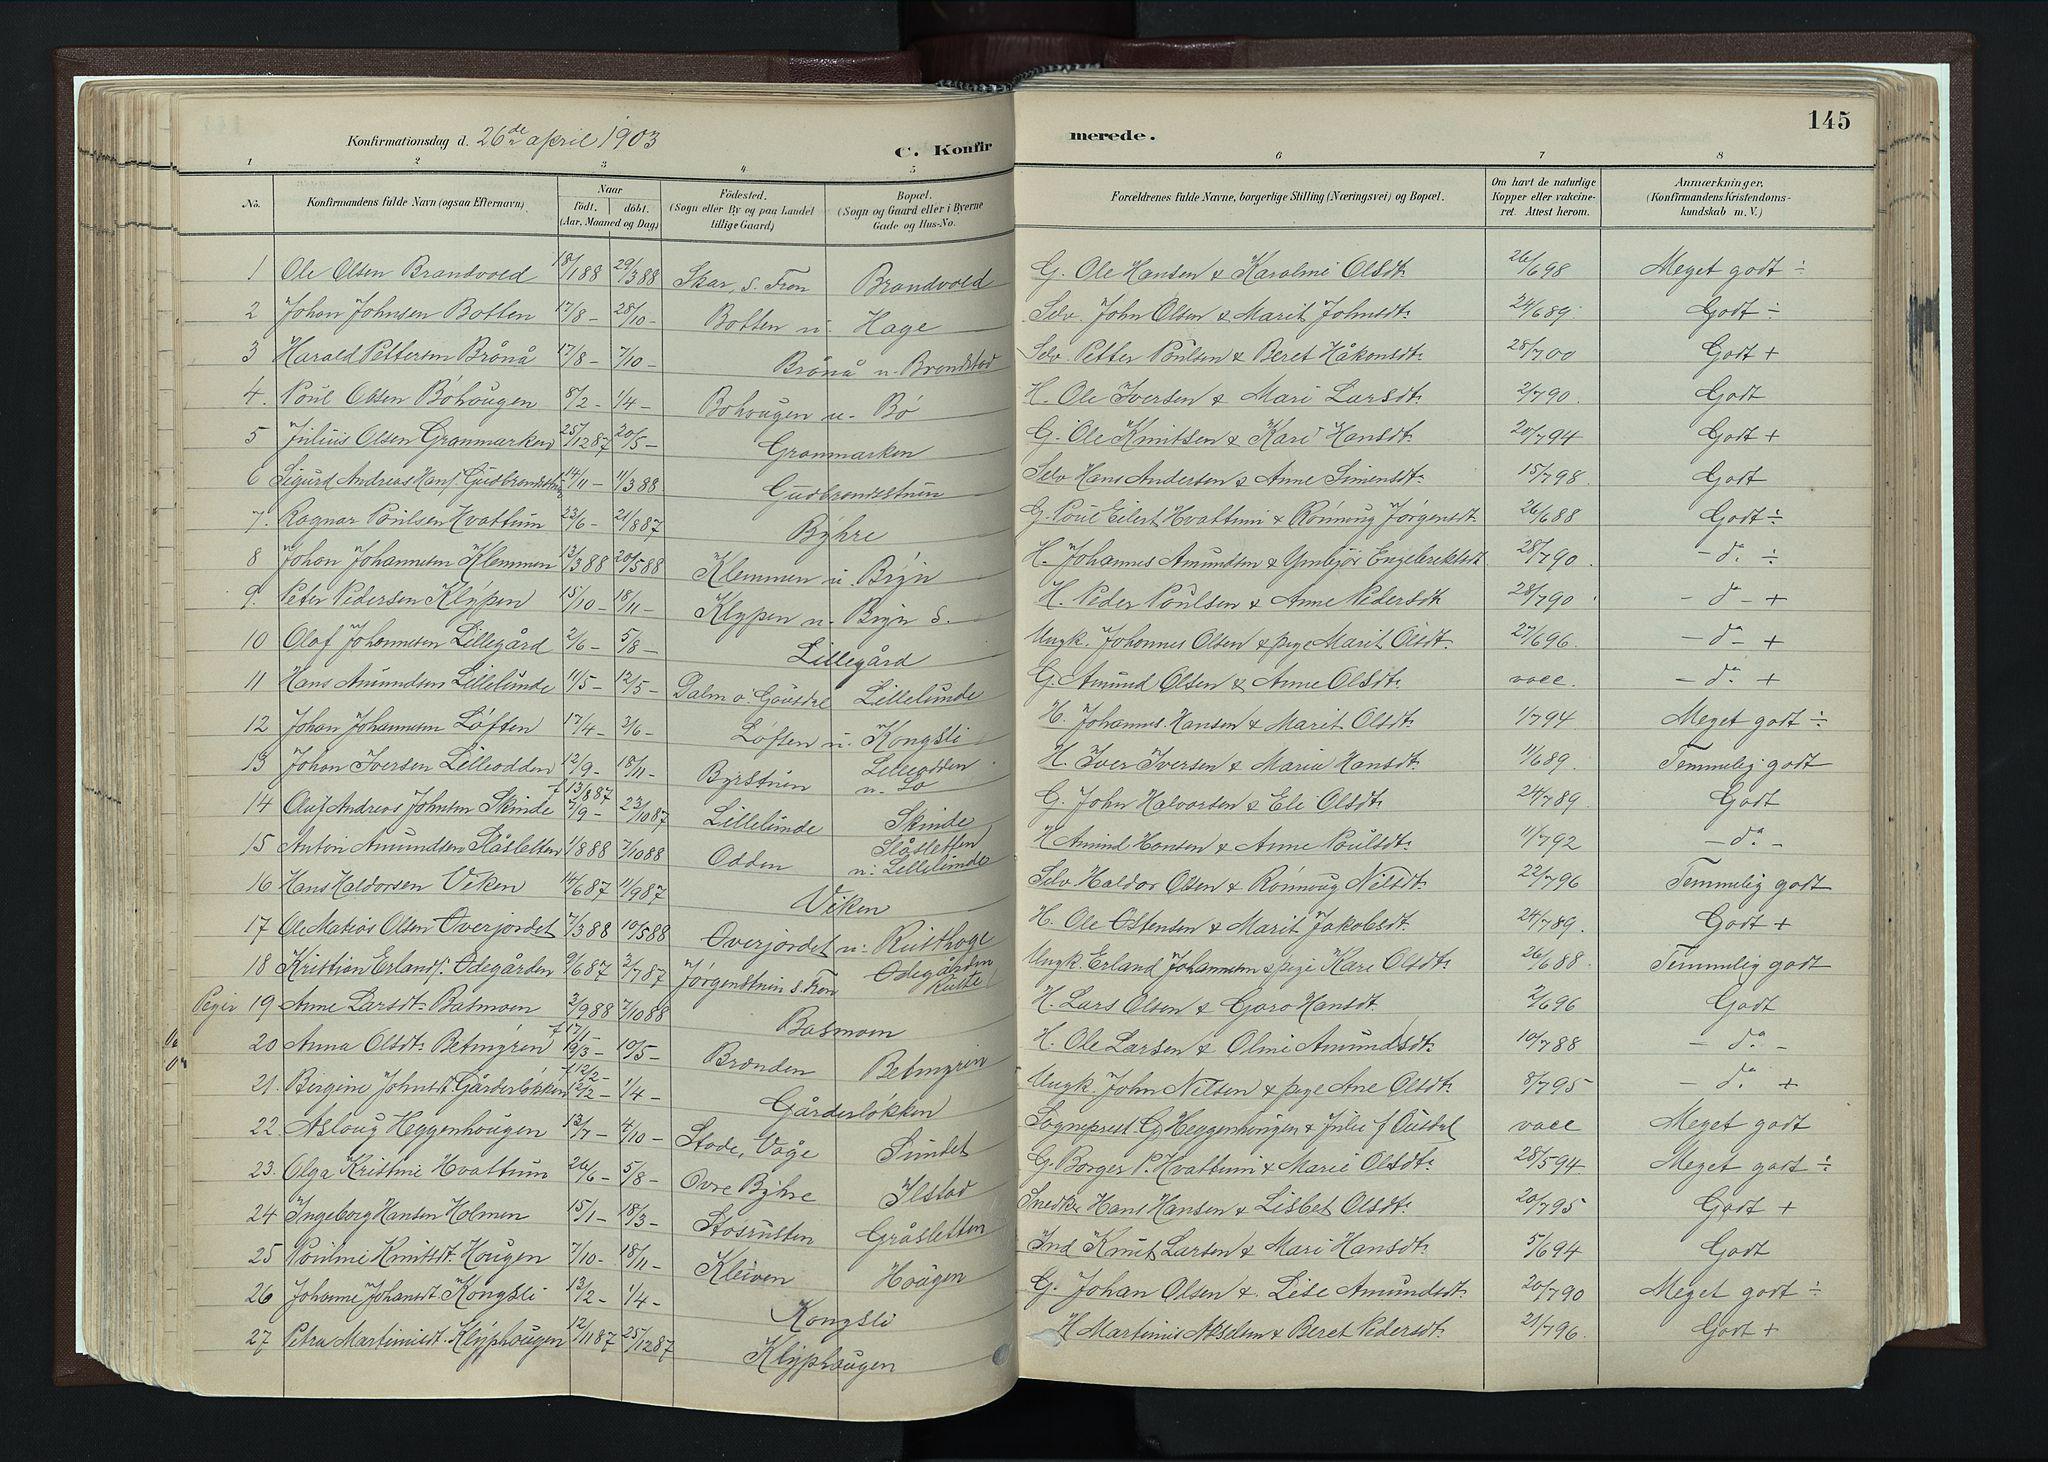 SAH, Nord-Fron prestekontor, Ministerialbok nr. 4, 1884-1914, s. 145